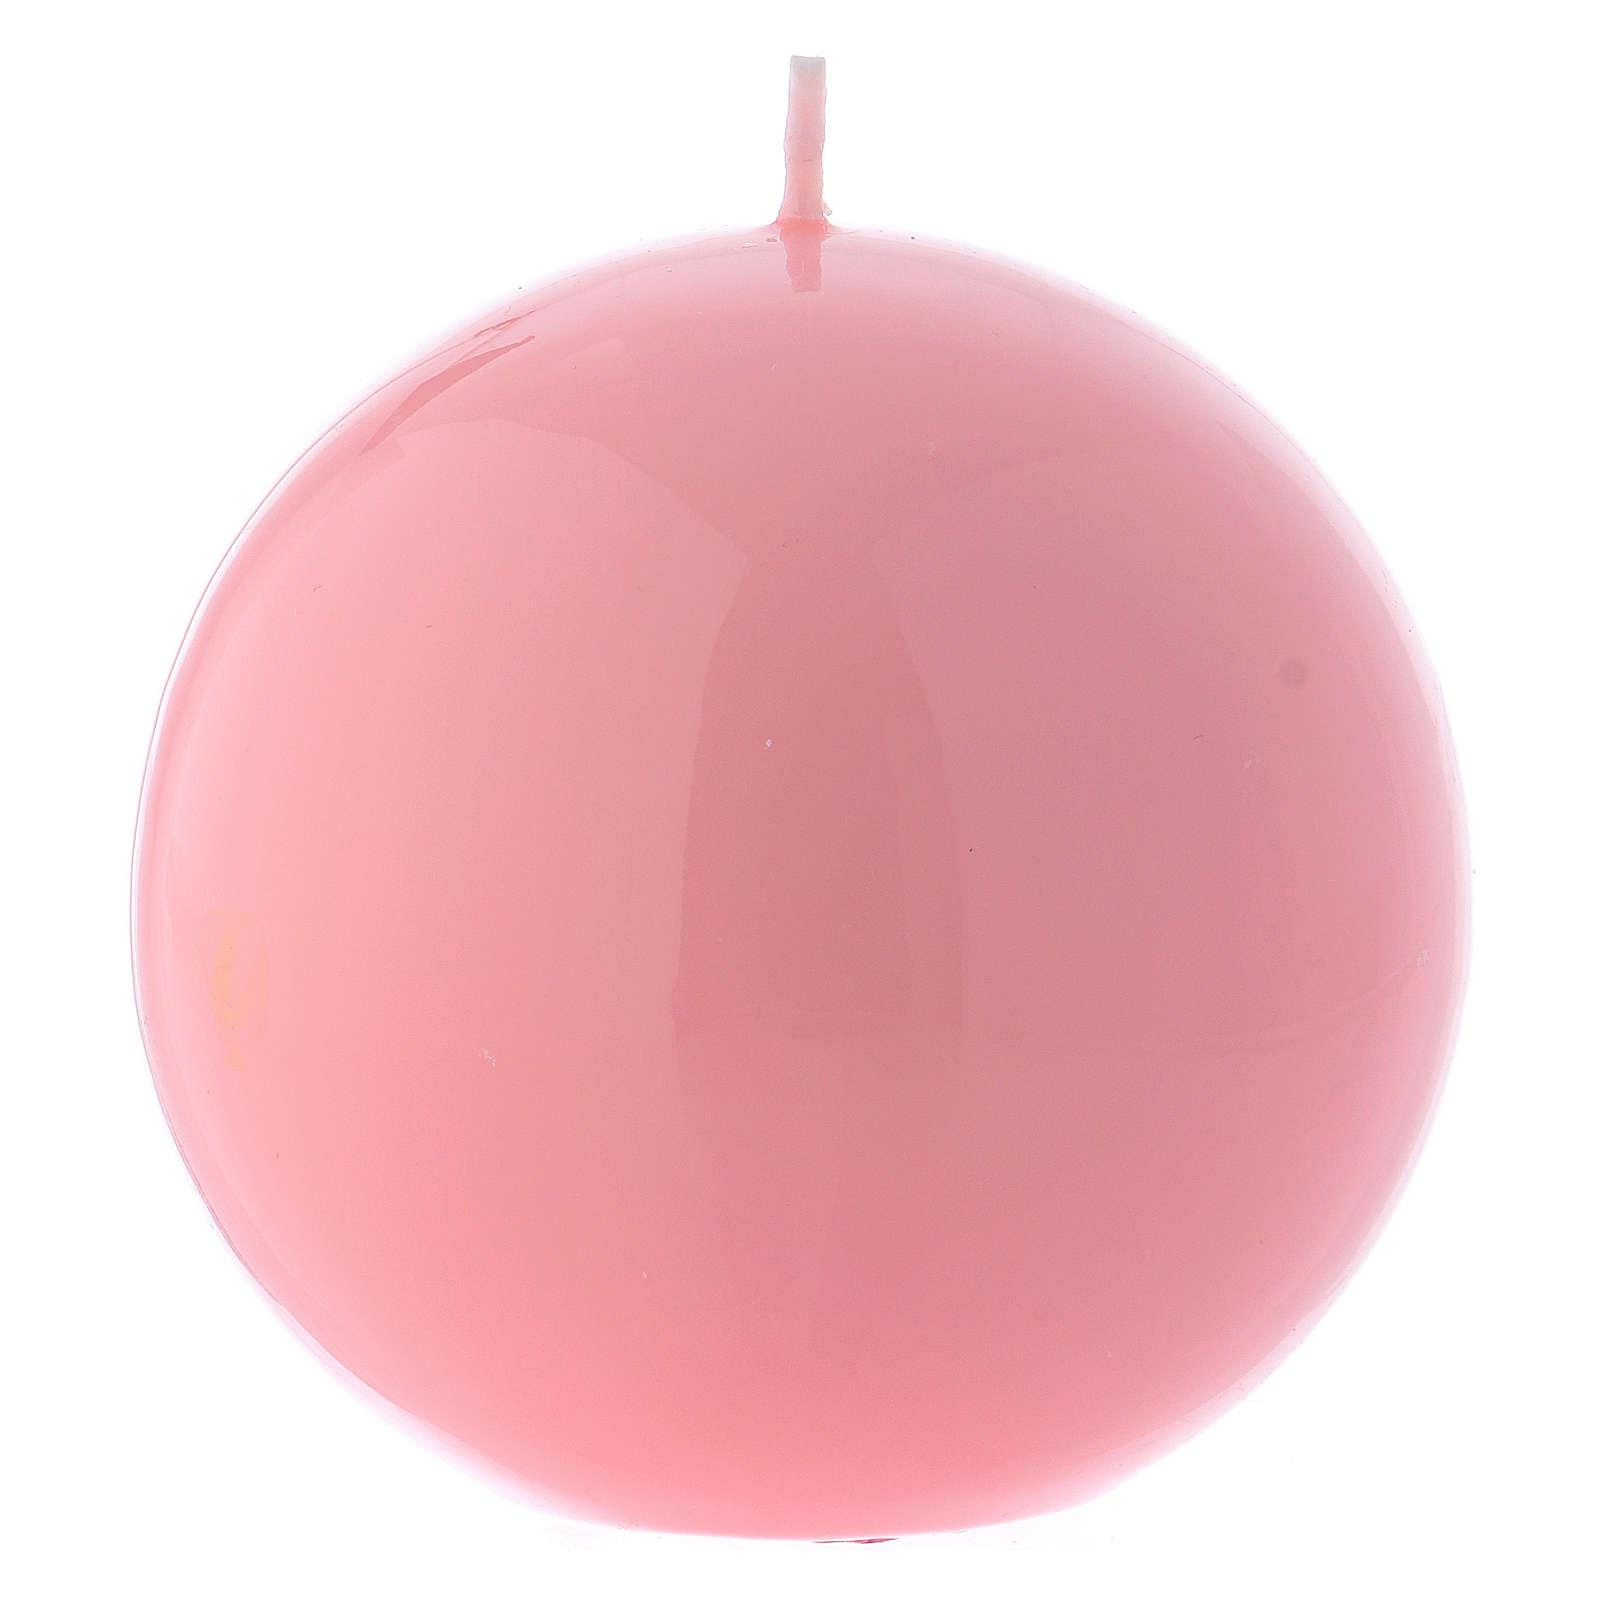 Vela de Altar Esfera Ceralacca Rosa d. 10 cm 3